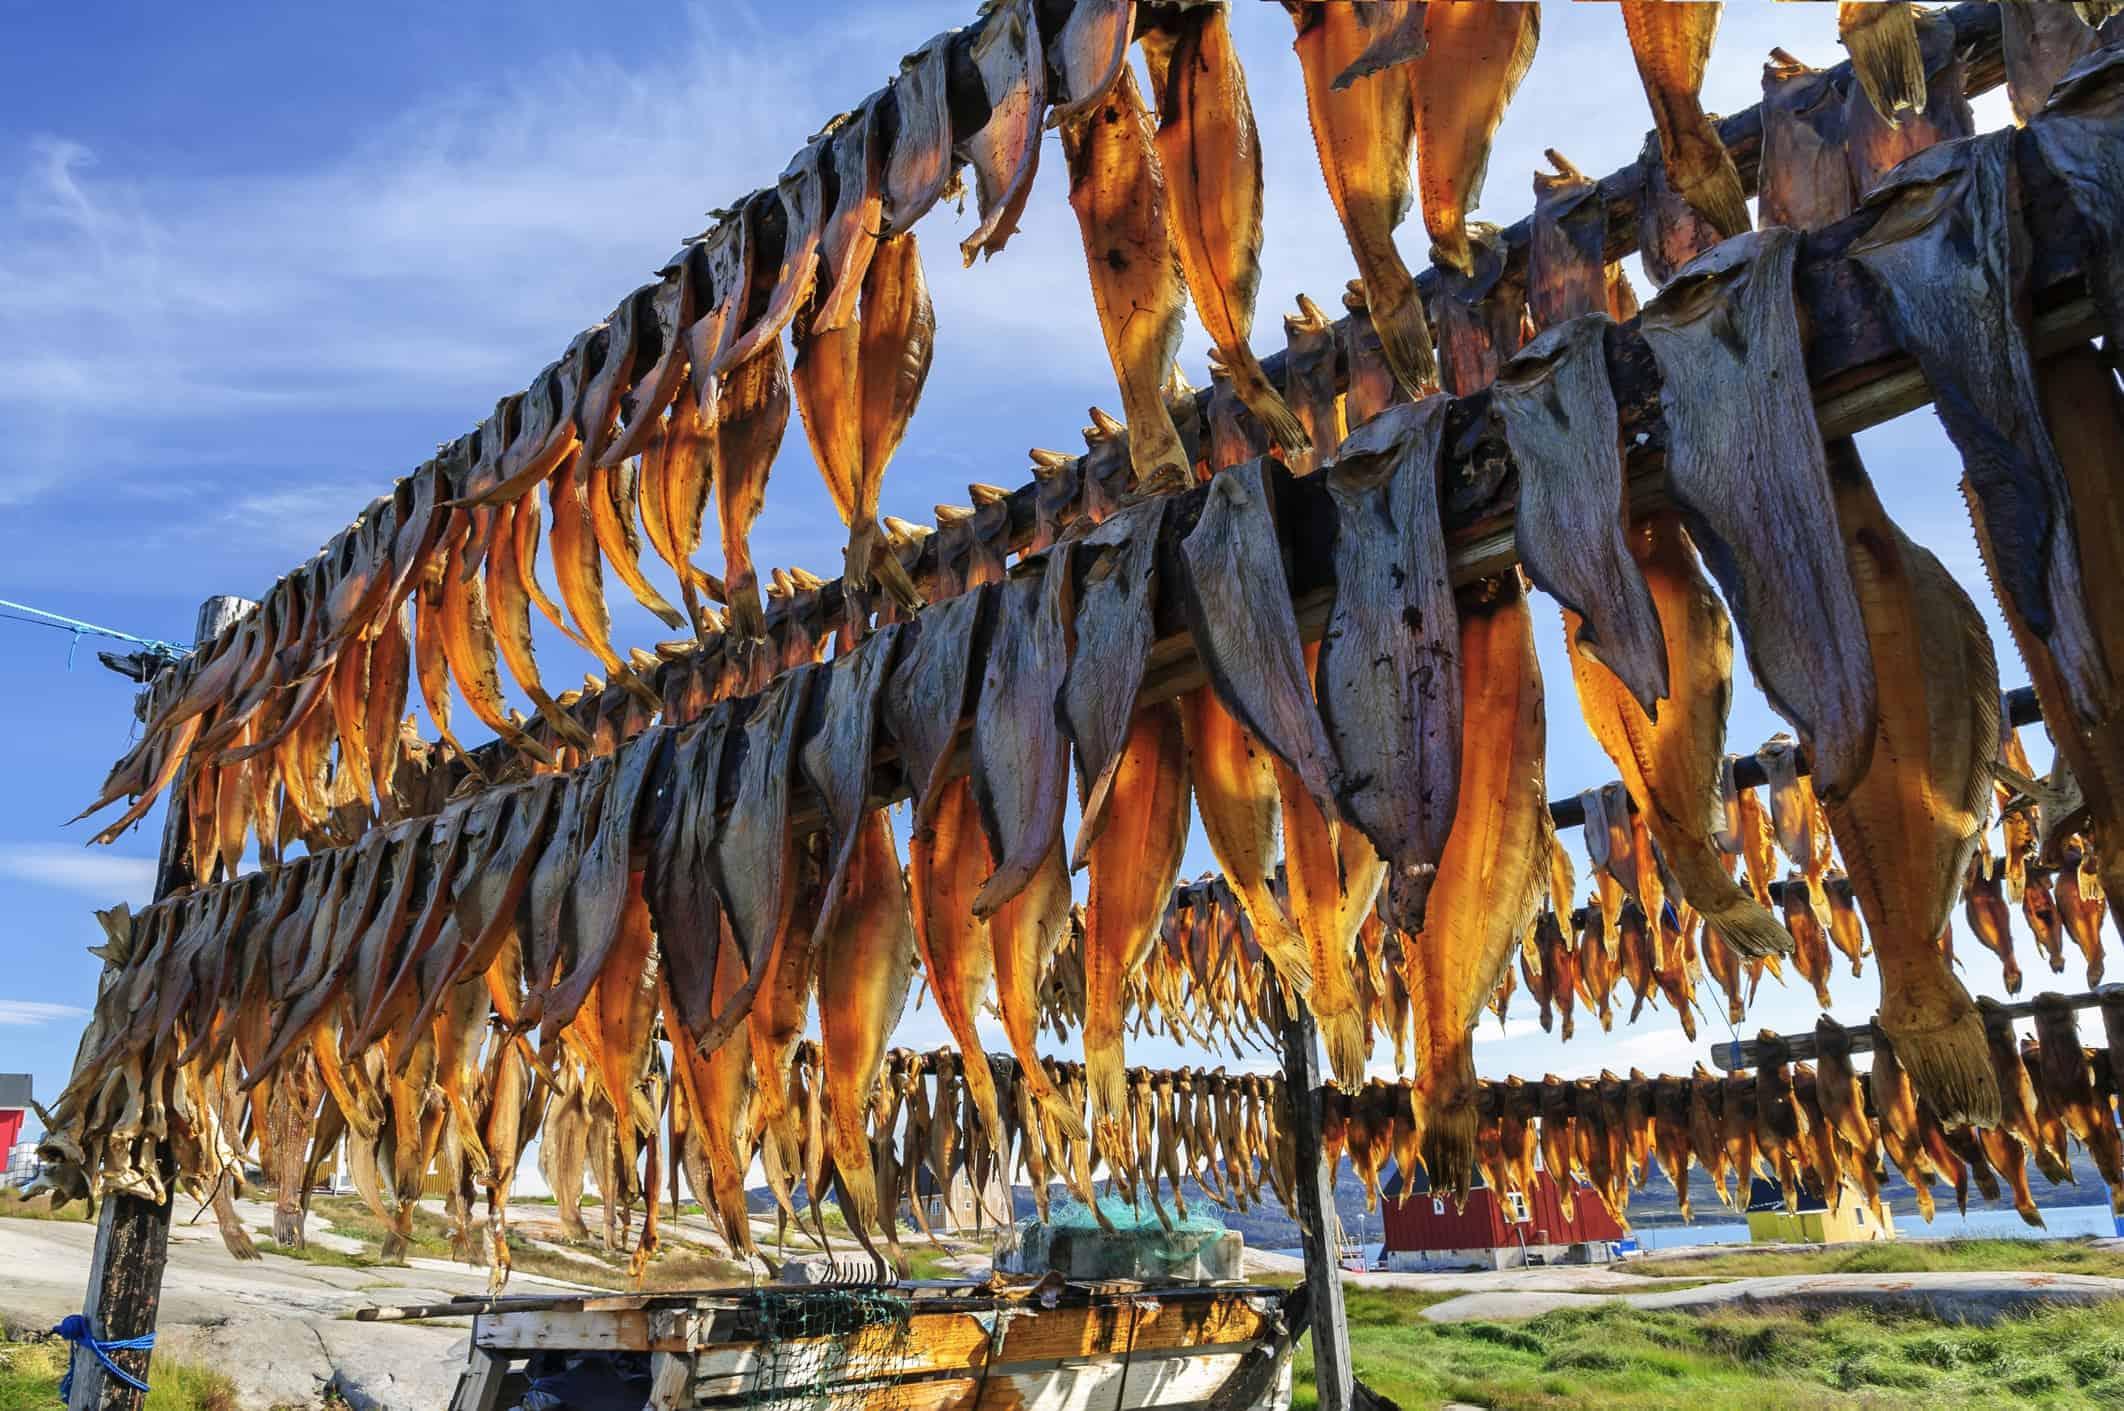 Greenland dried fish